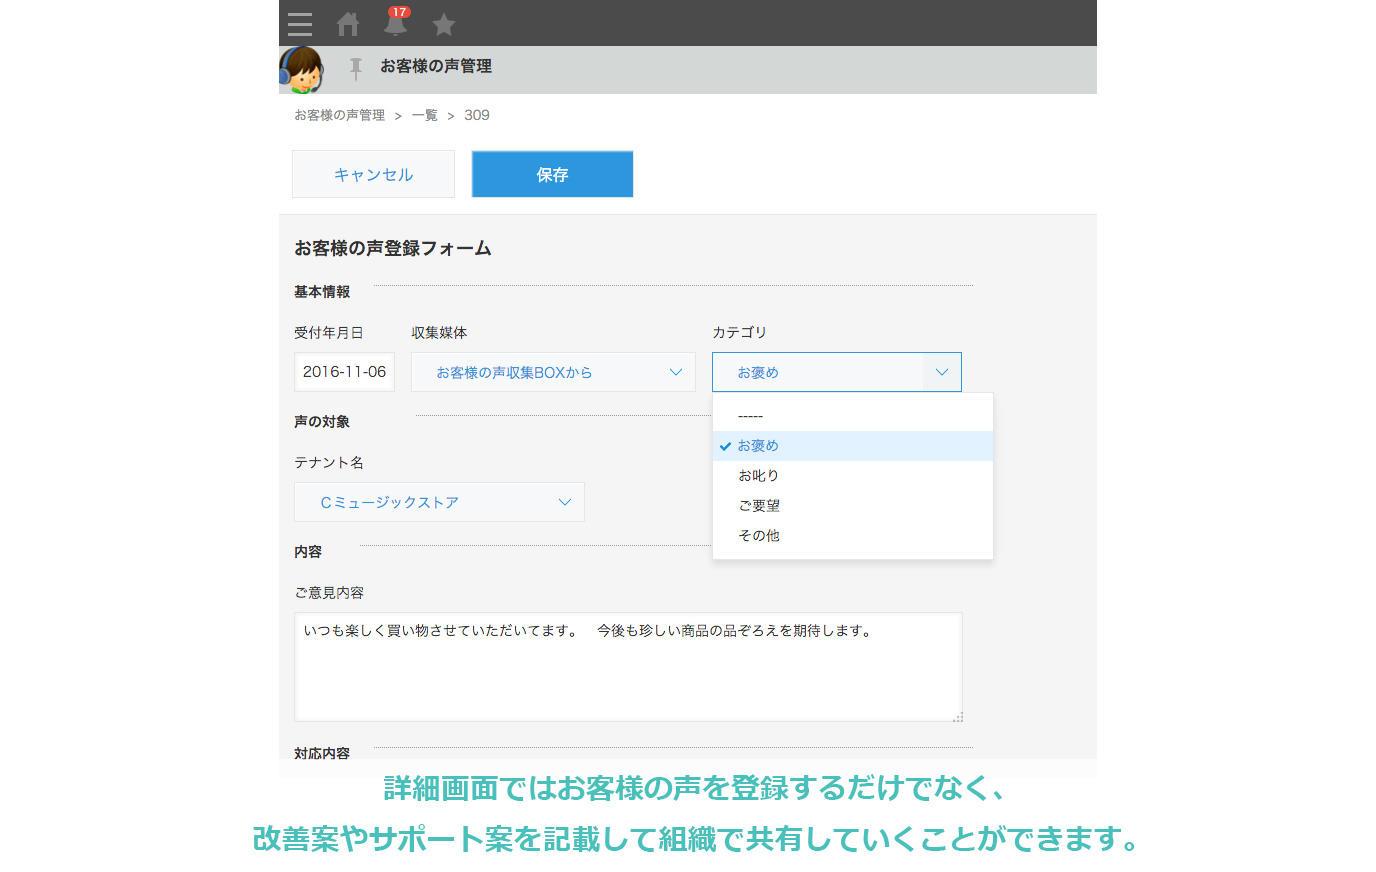 ktp_53_3.jpg